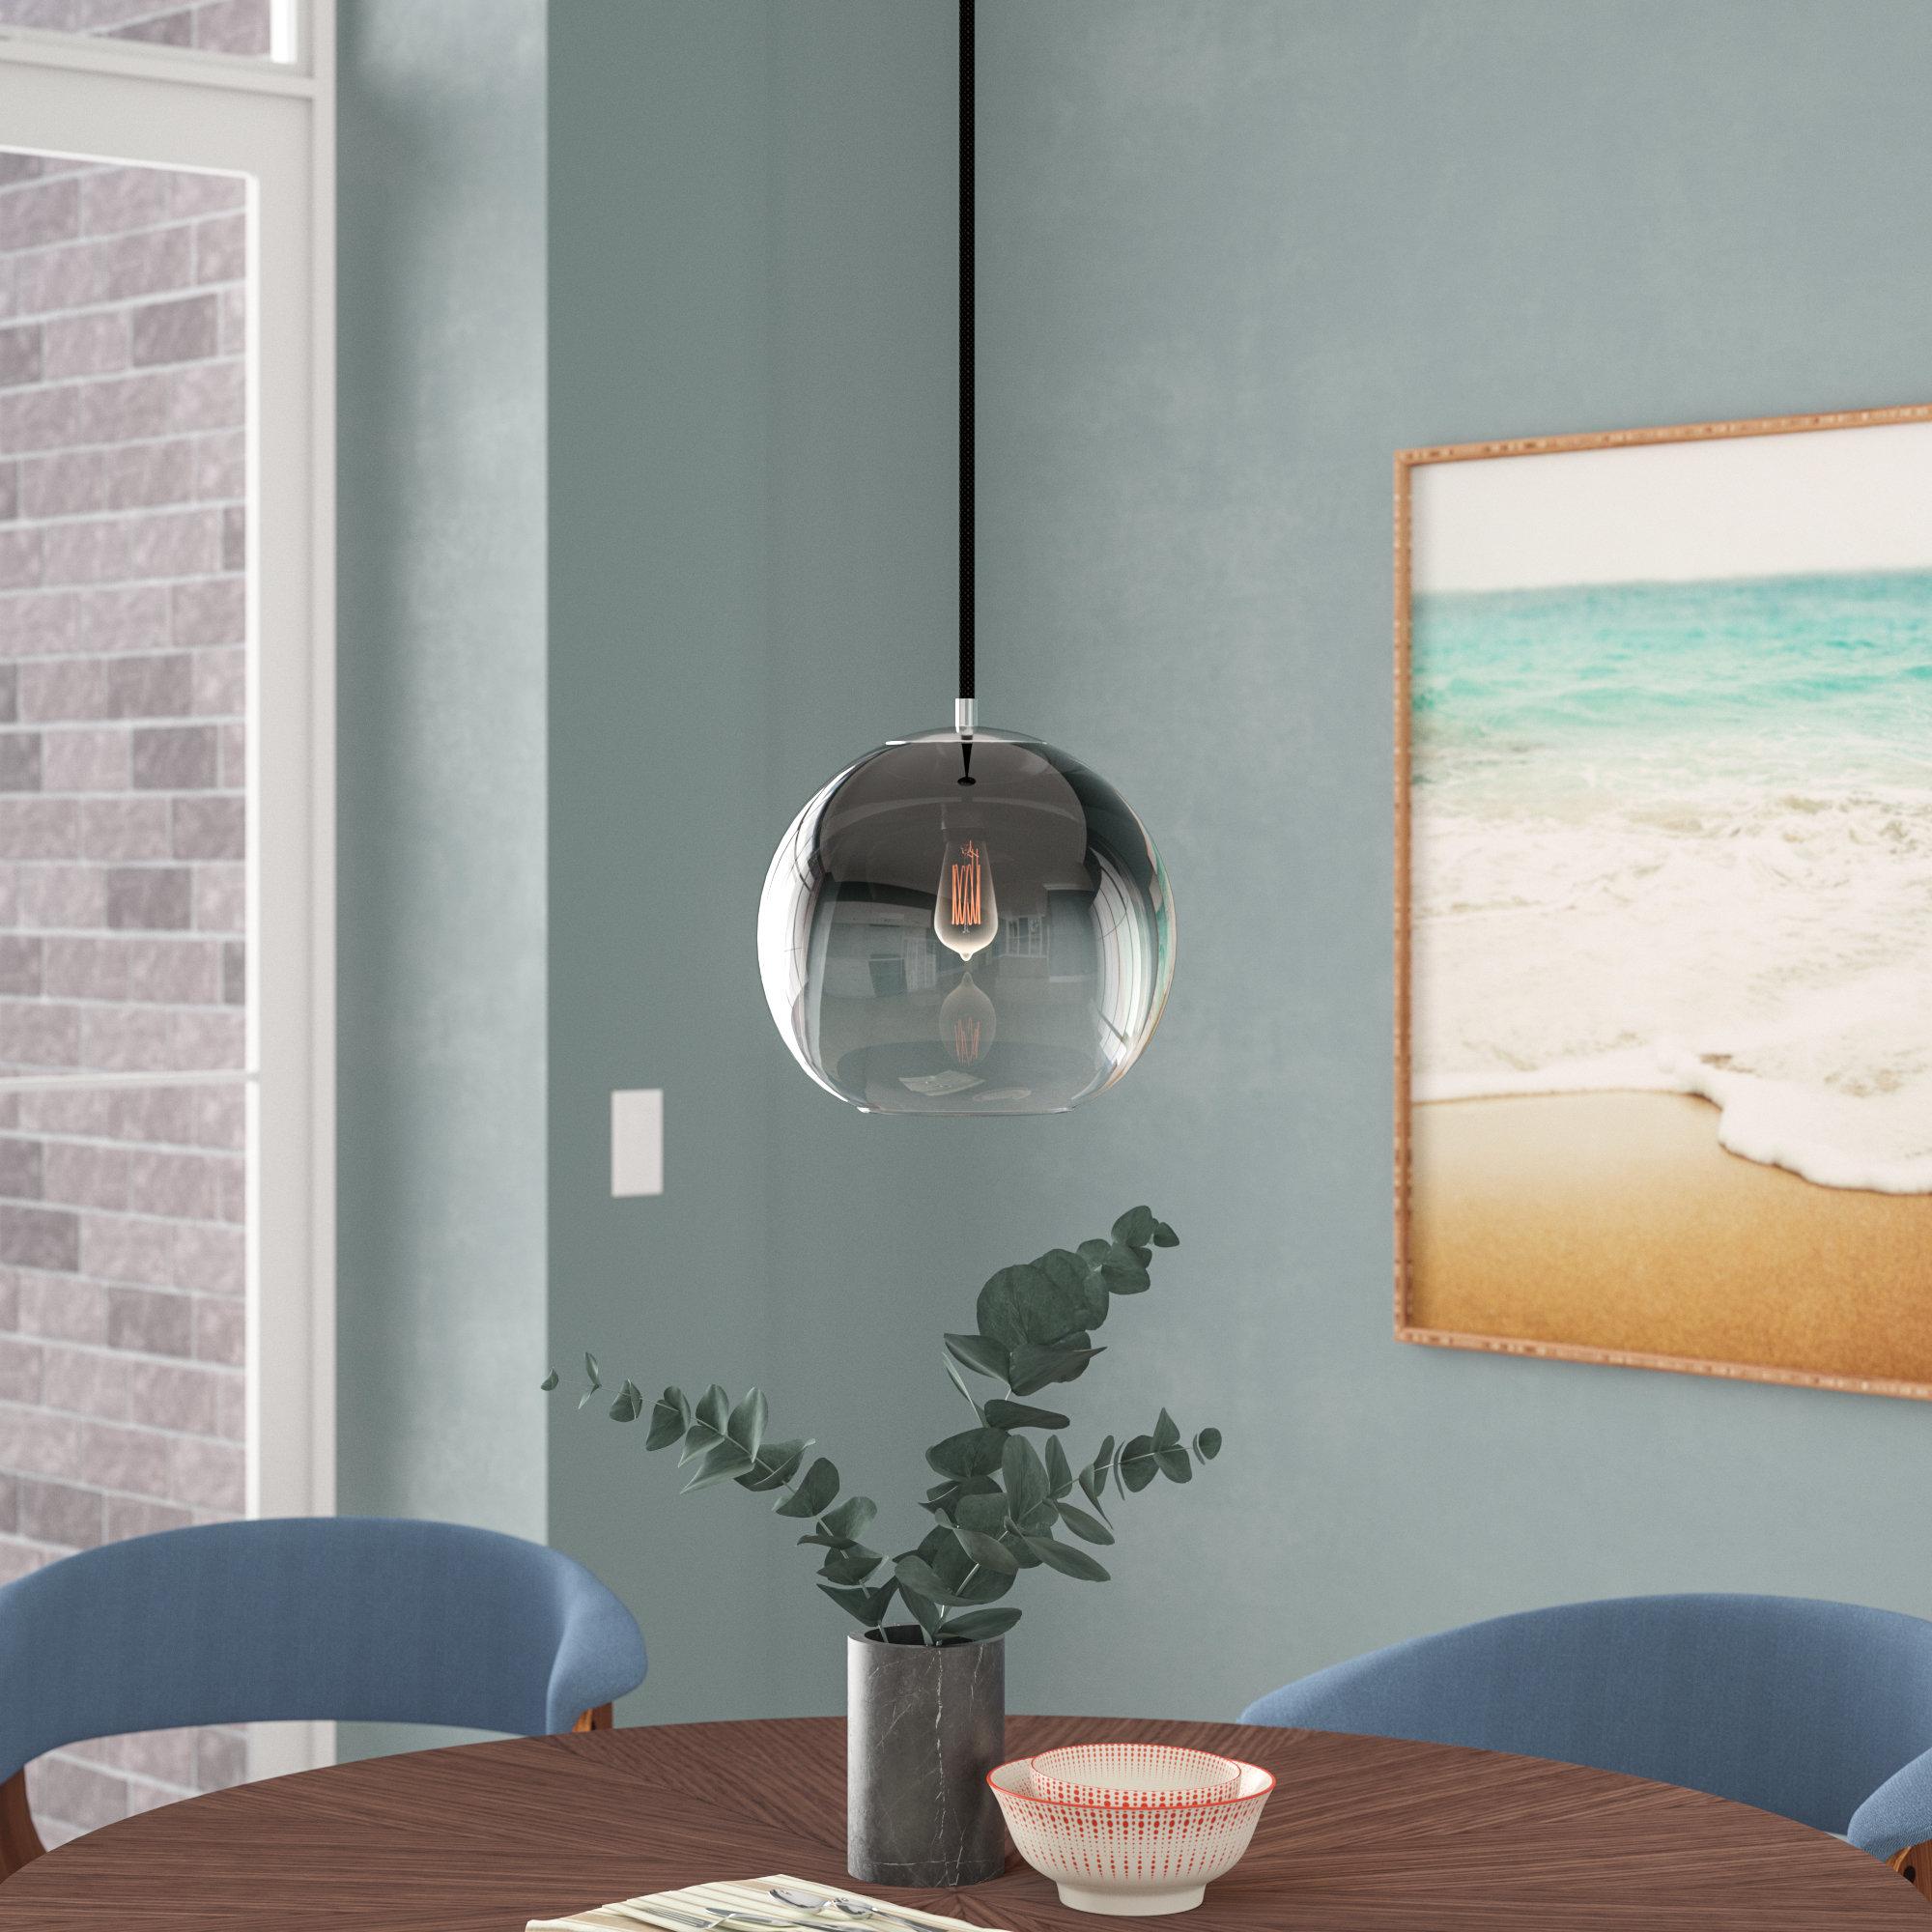 1 Light Globe Pendant With 1 Light Globe Pendants (View 3 of 30)